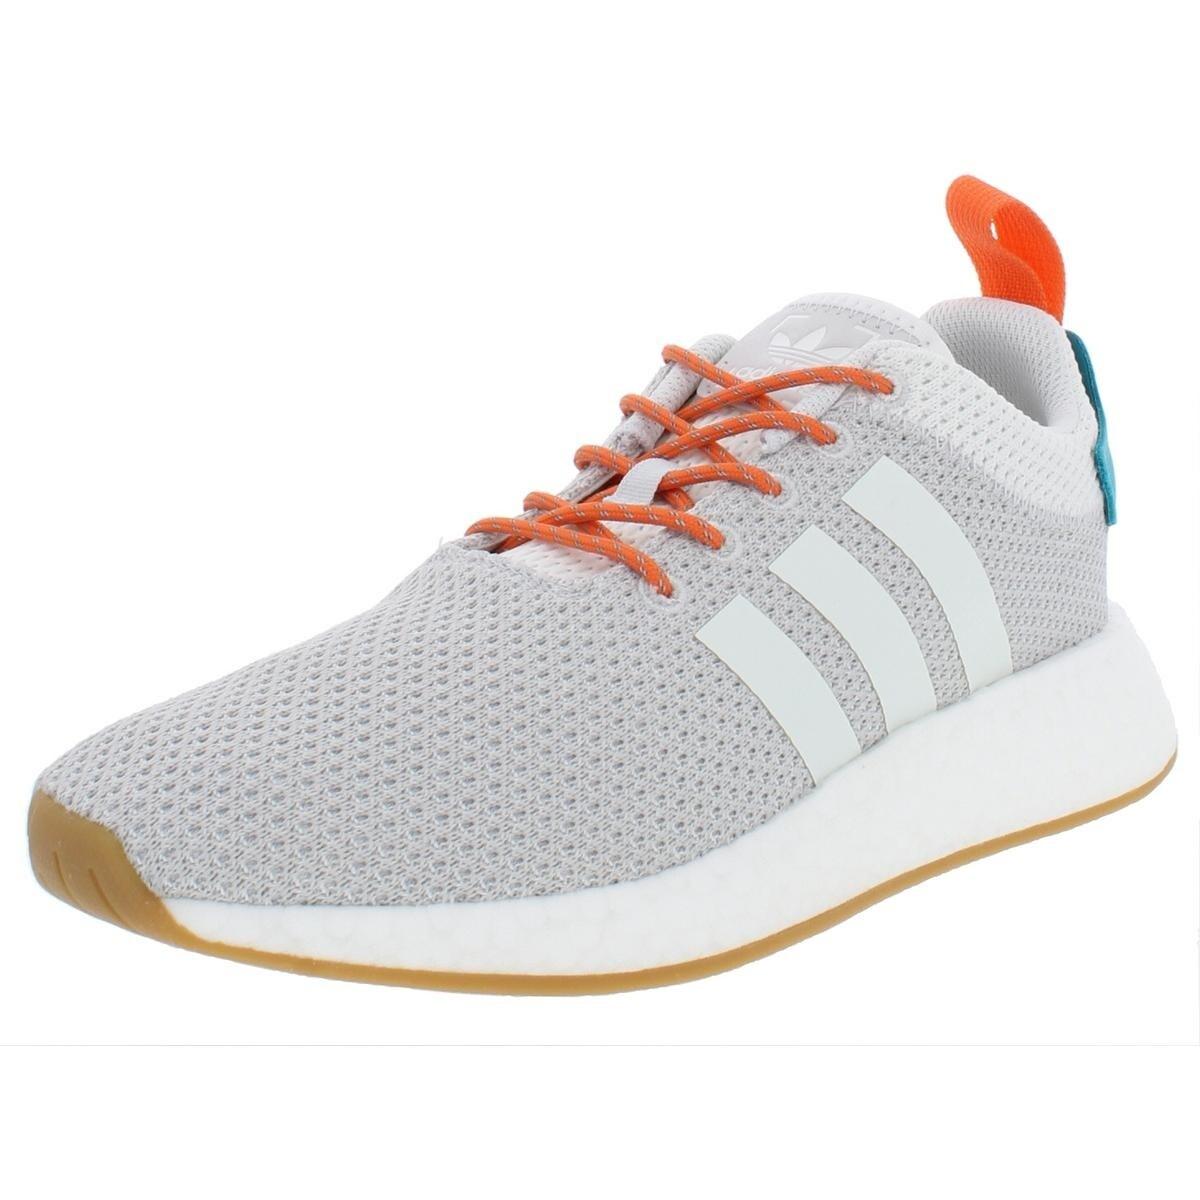 new arrival 4bab1 3b1bb adidas Originals Mens NMD R2 Summer Athletic Shoes Knit Running